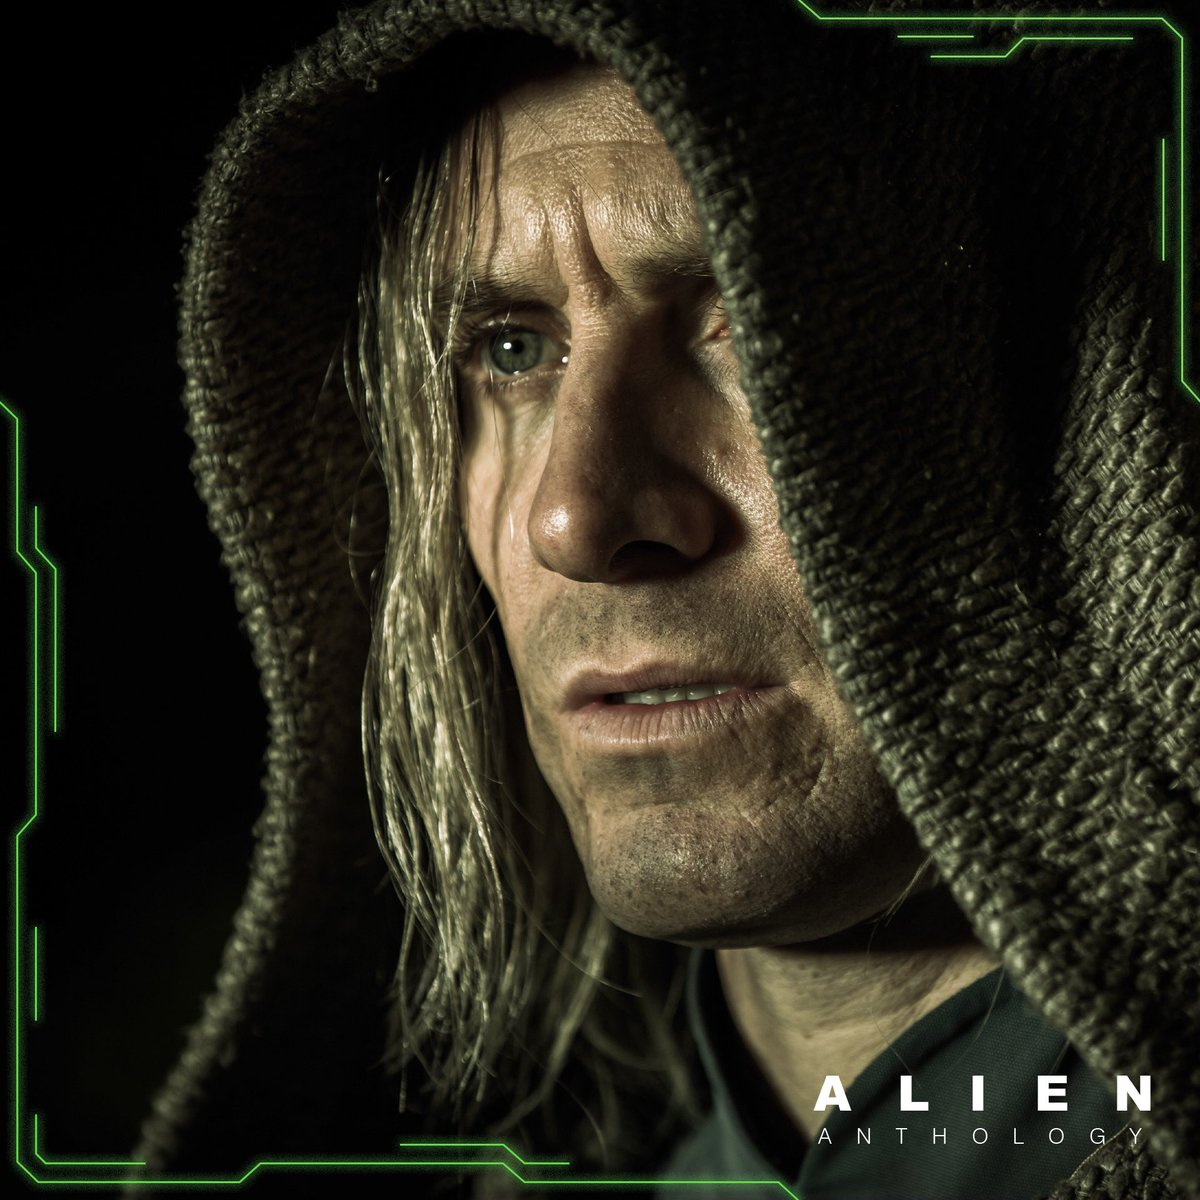 Aliens vs. Predator - Requiem (2007)